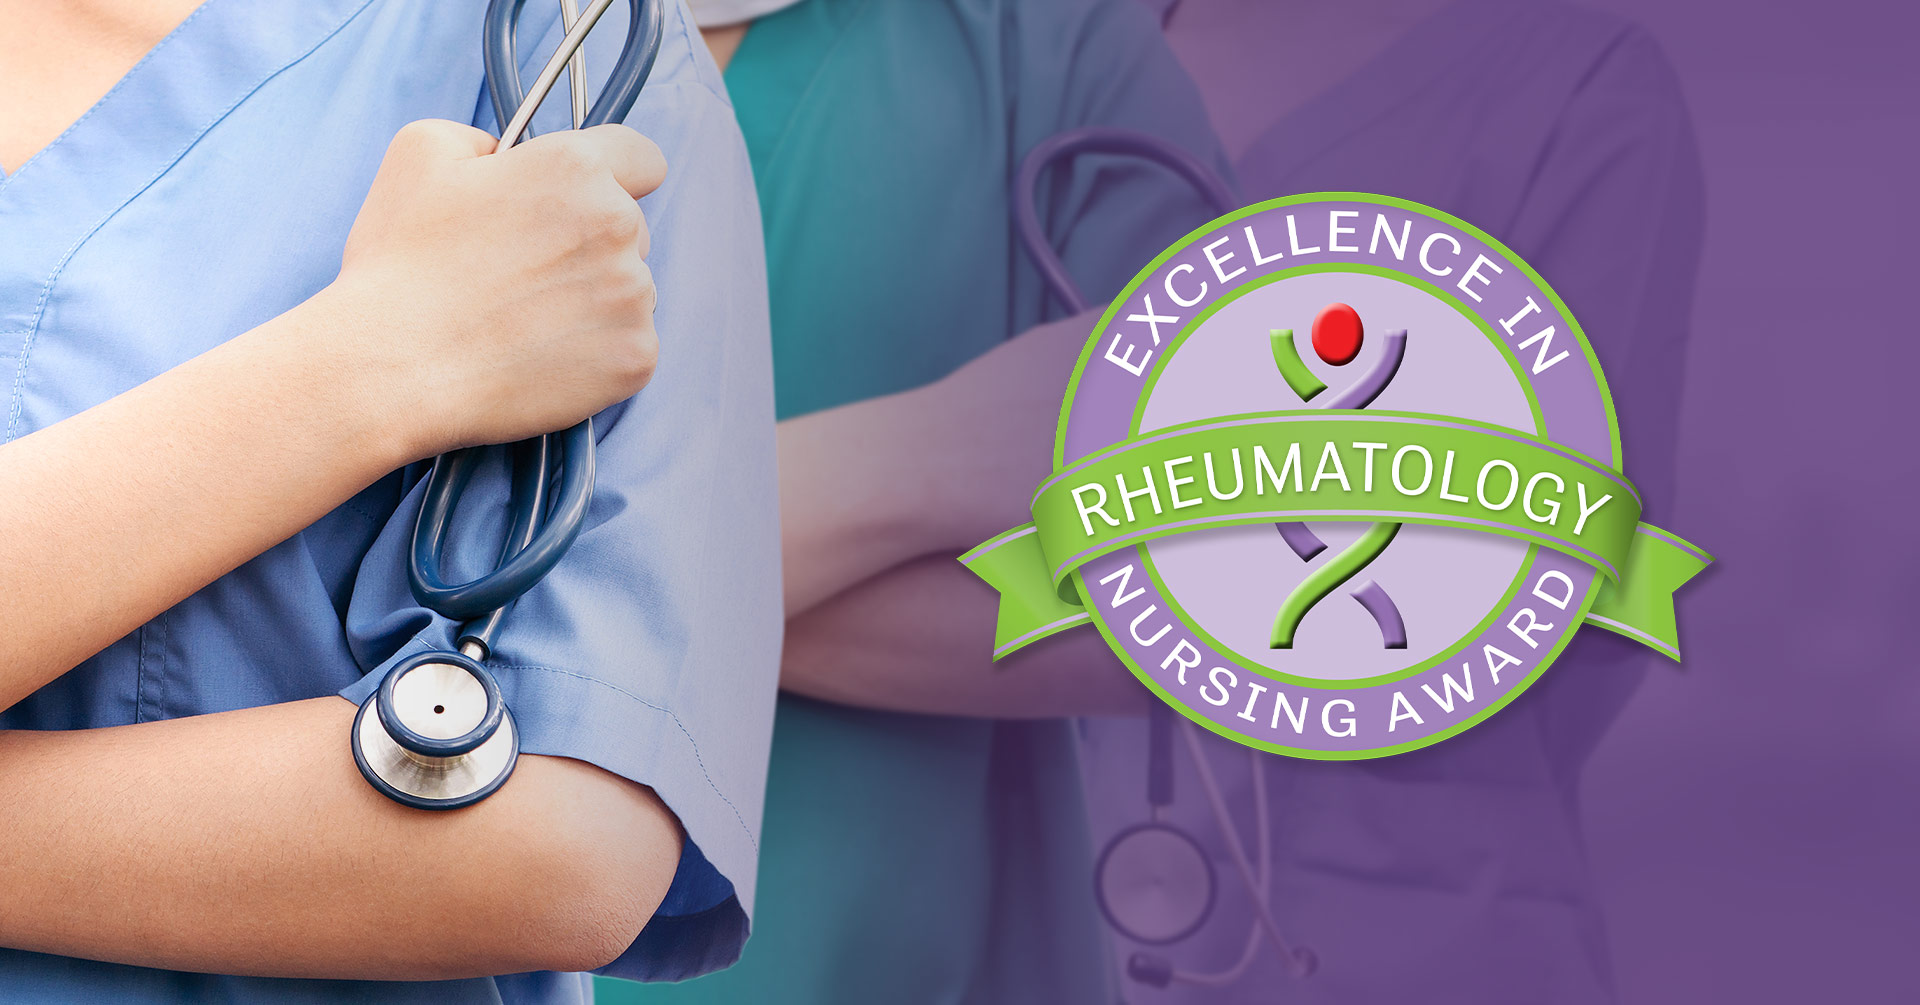 Excellence in Rheumatology Nursing Award